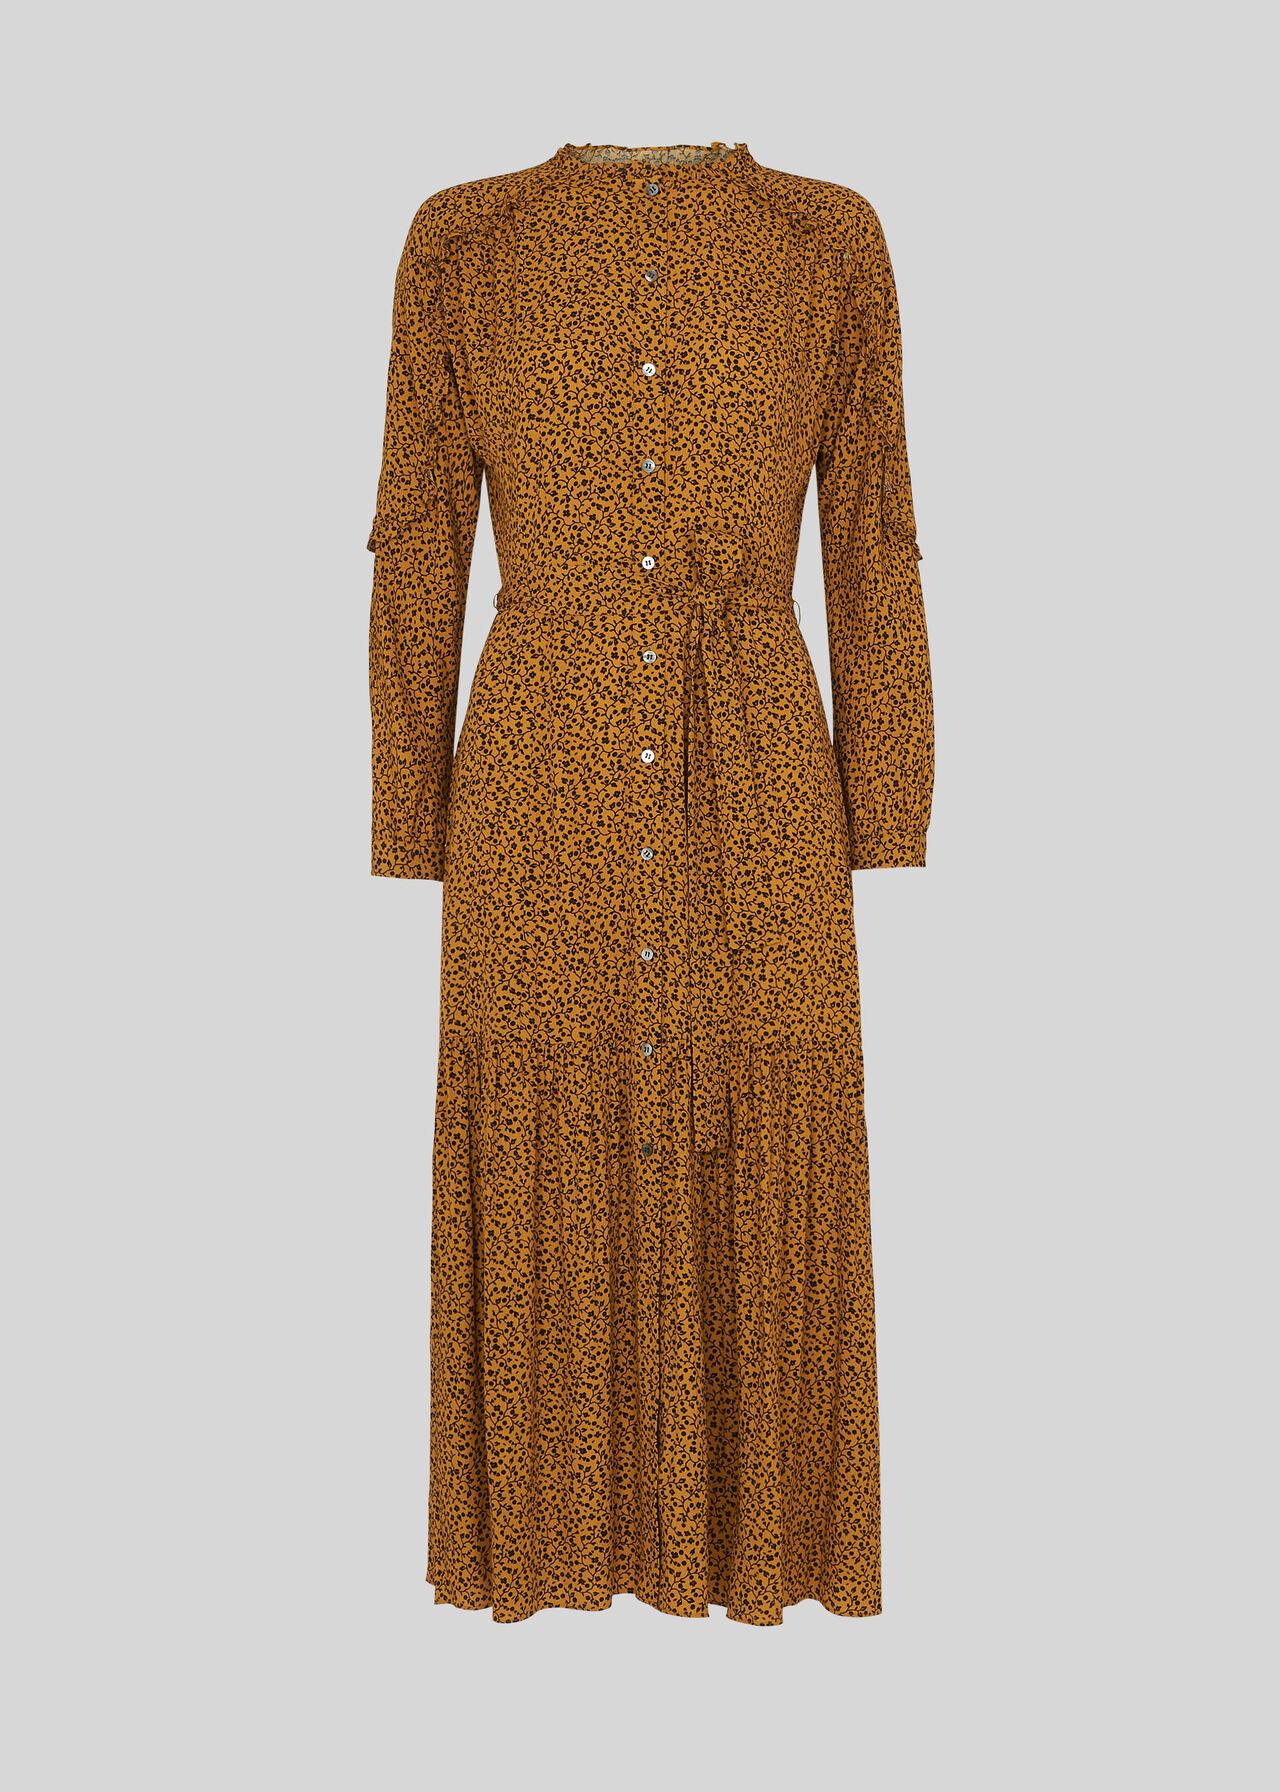 Renee Autumn Floral Dress Yellow/Multi